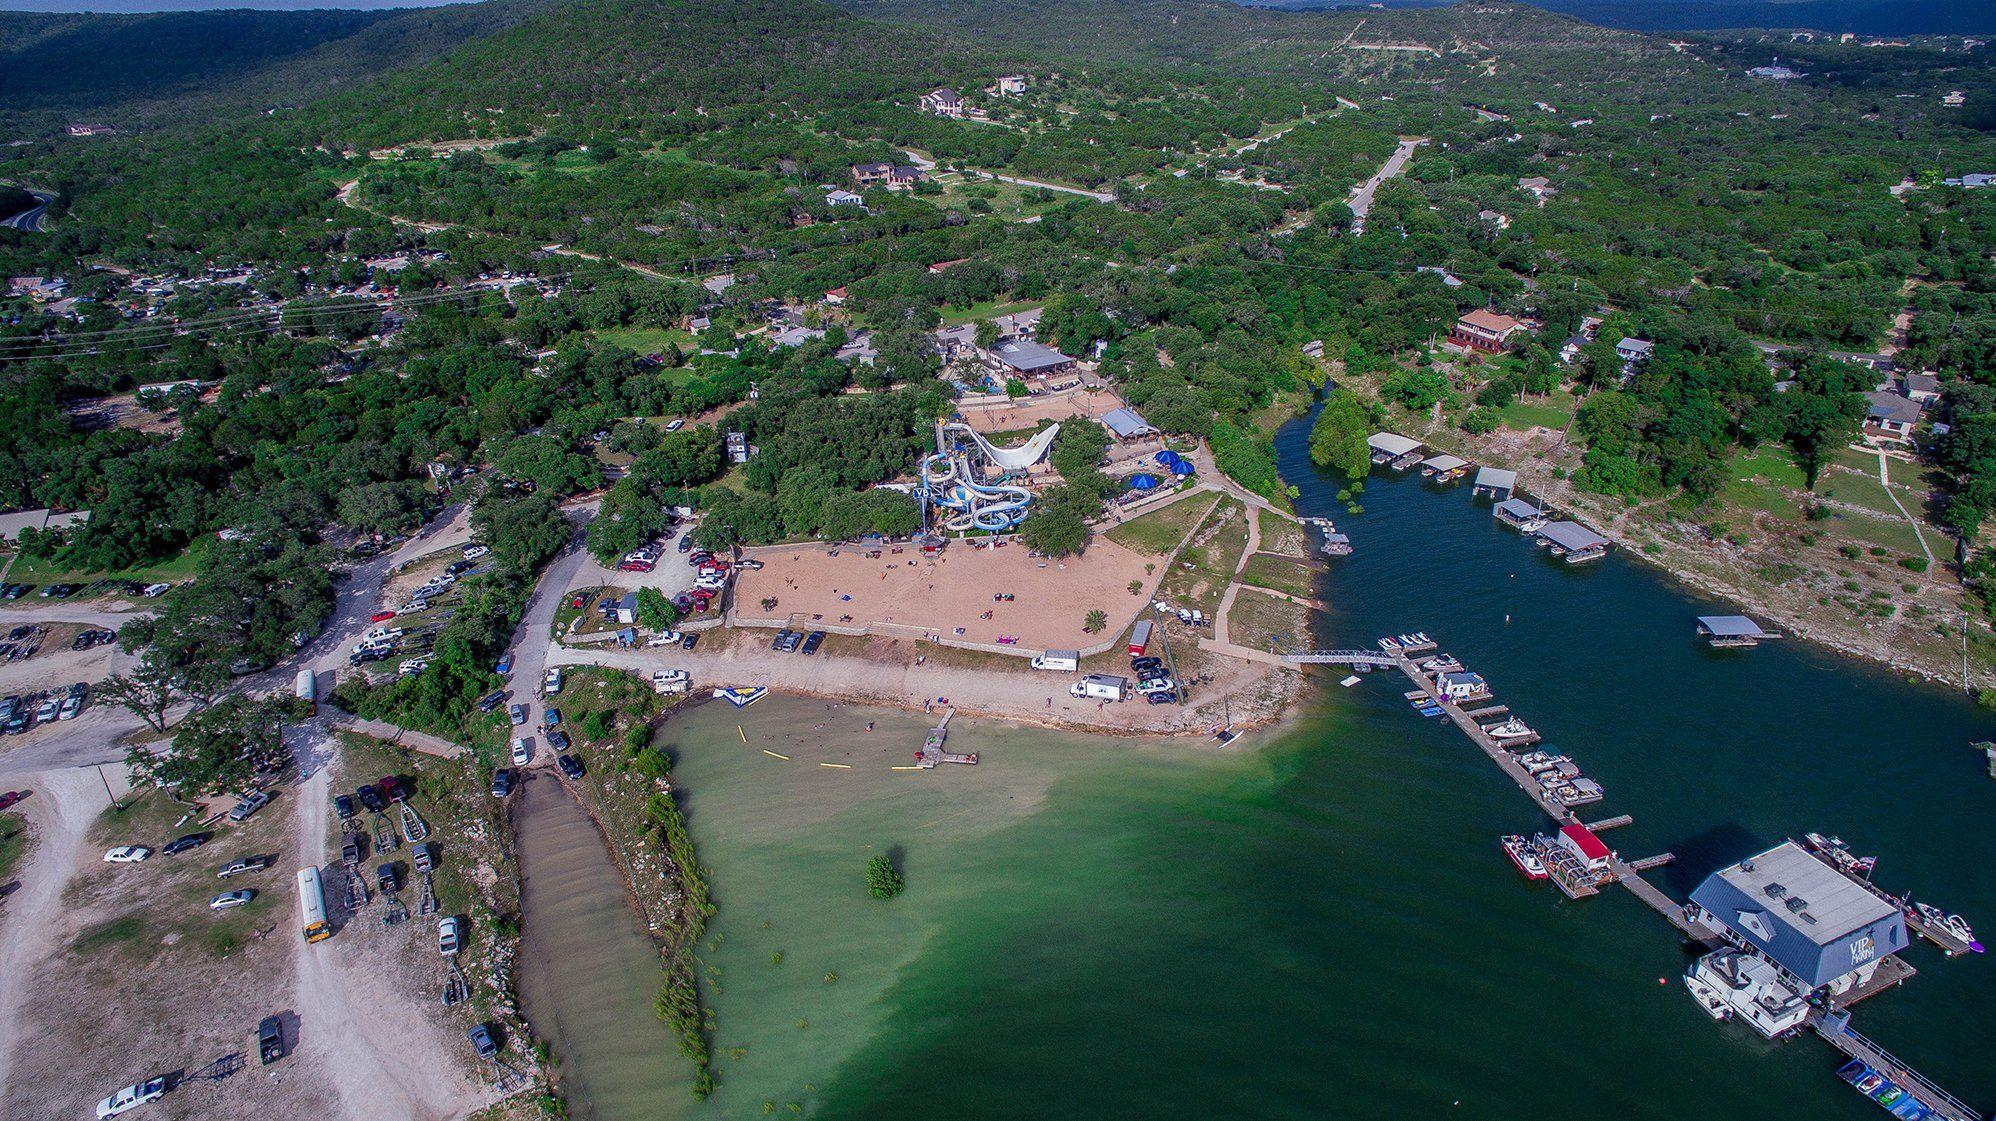 Beachside Billyu0027s Restaurant And Lake Travis Waterpark, Upscale Casual  Dining. A Beach Bar U0026 Grill. Kid Options   Pizza, Funnel Cakes U0026 Ice Cream.